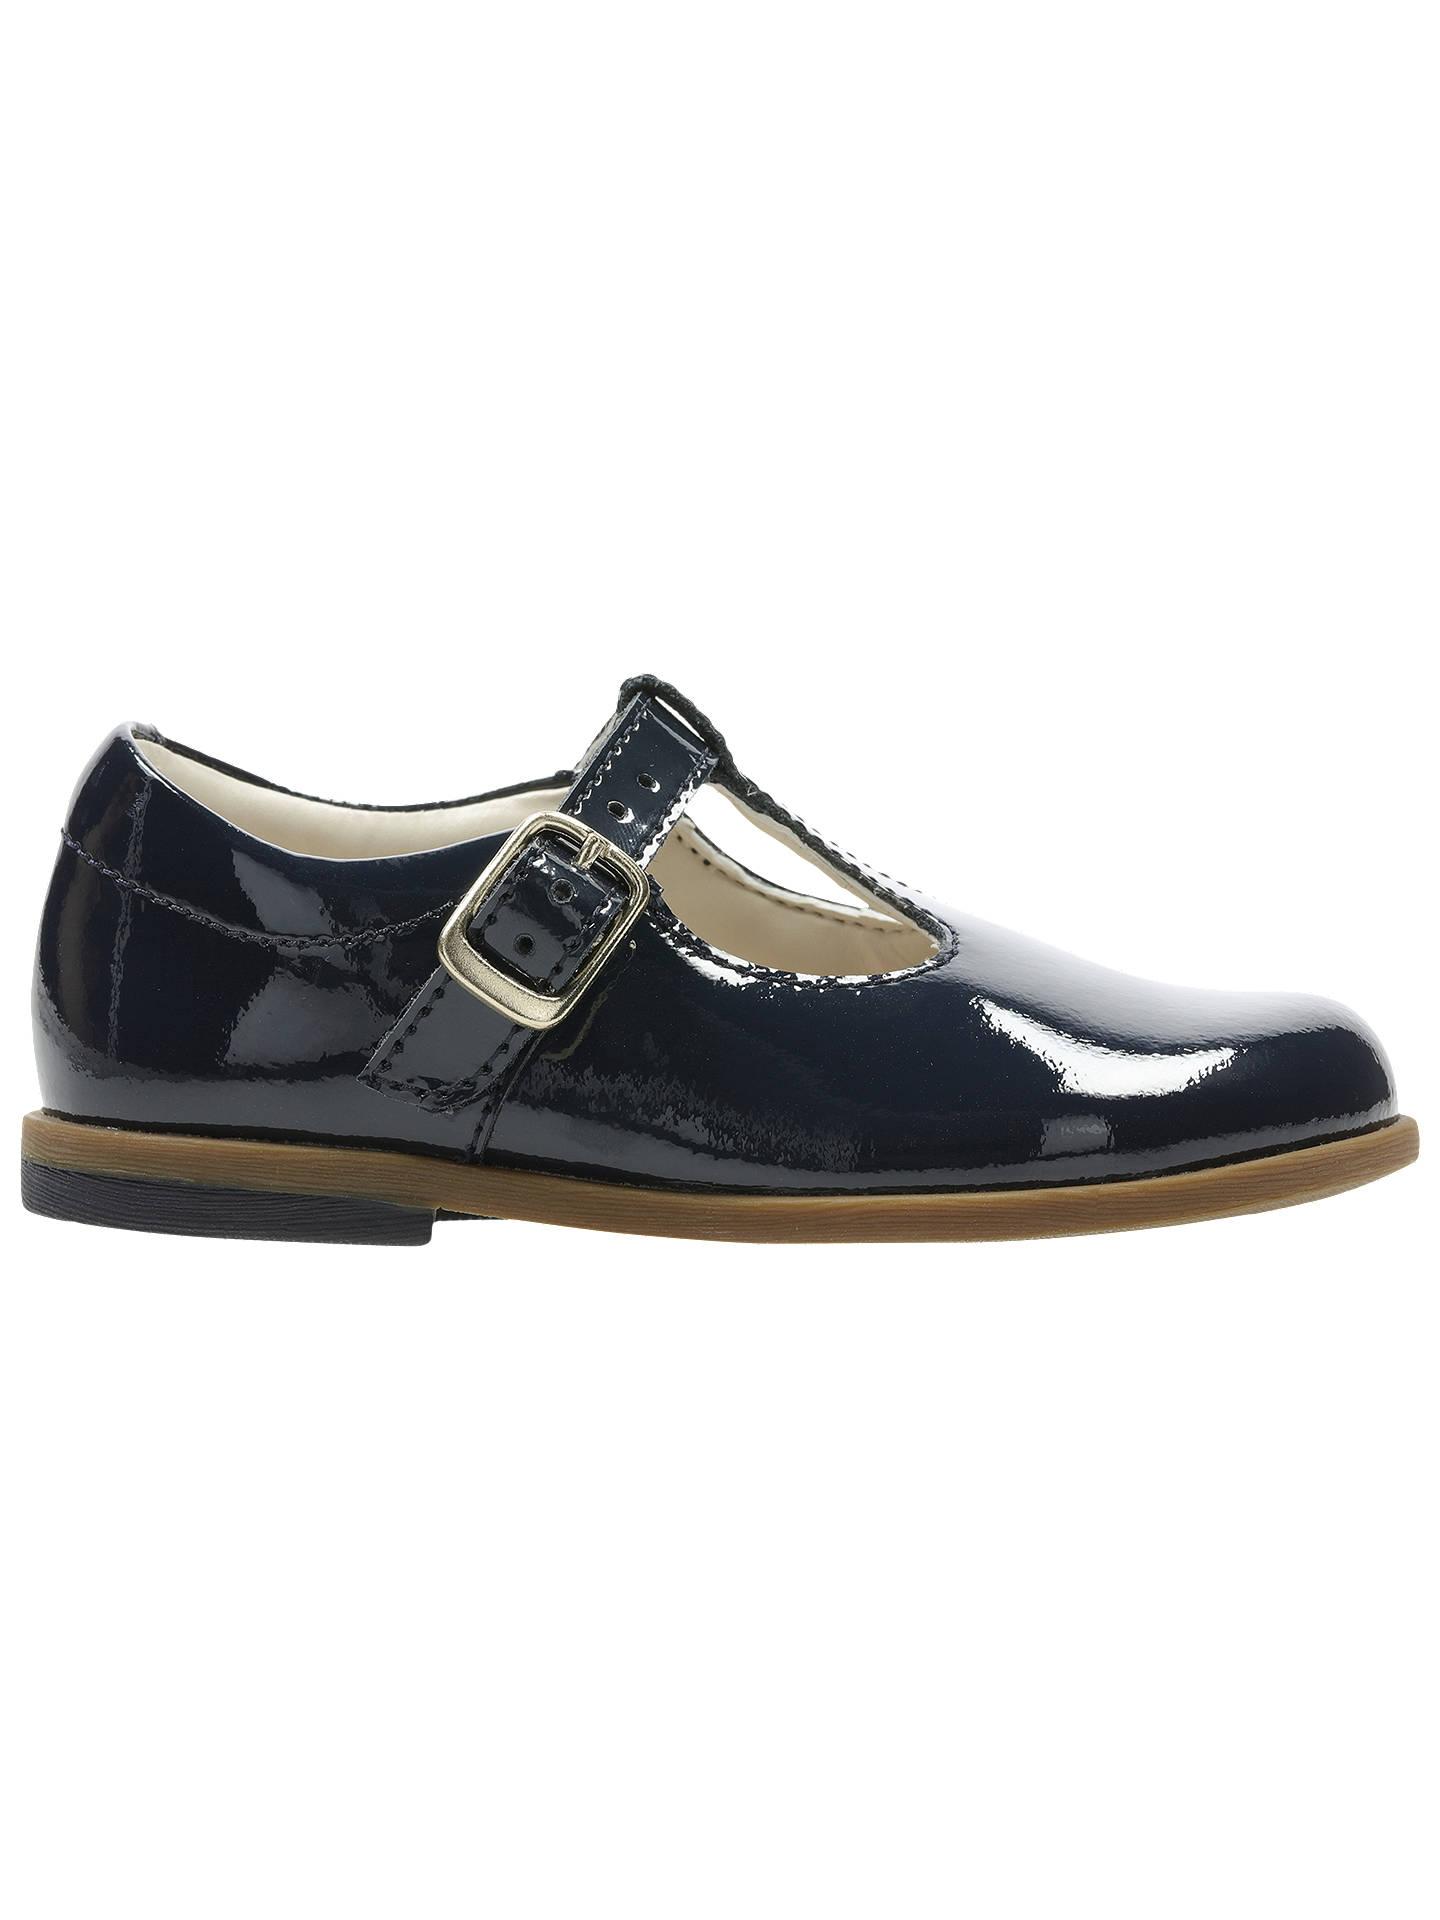 1ee4d20748f Buy Clarks Children's Drew Shine Shoes, Navy Patent, 4F Jnr Online at  johnlewis.